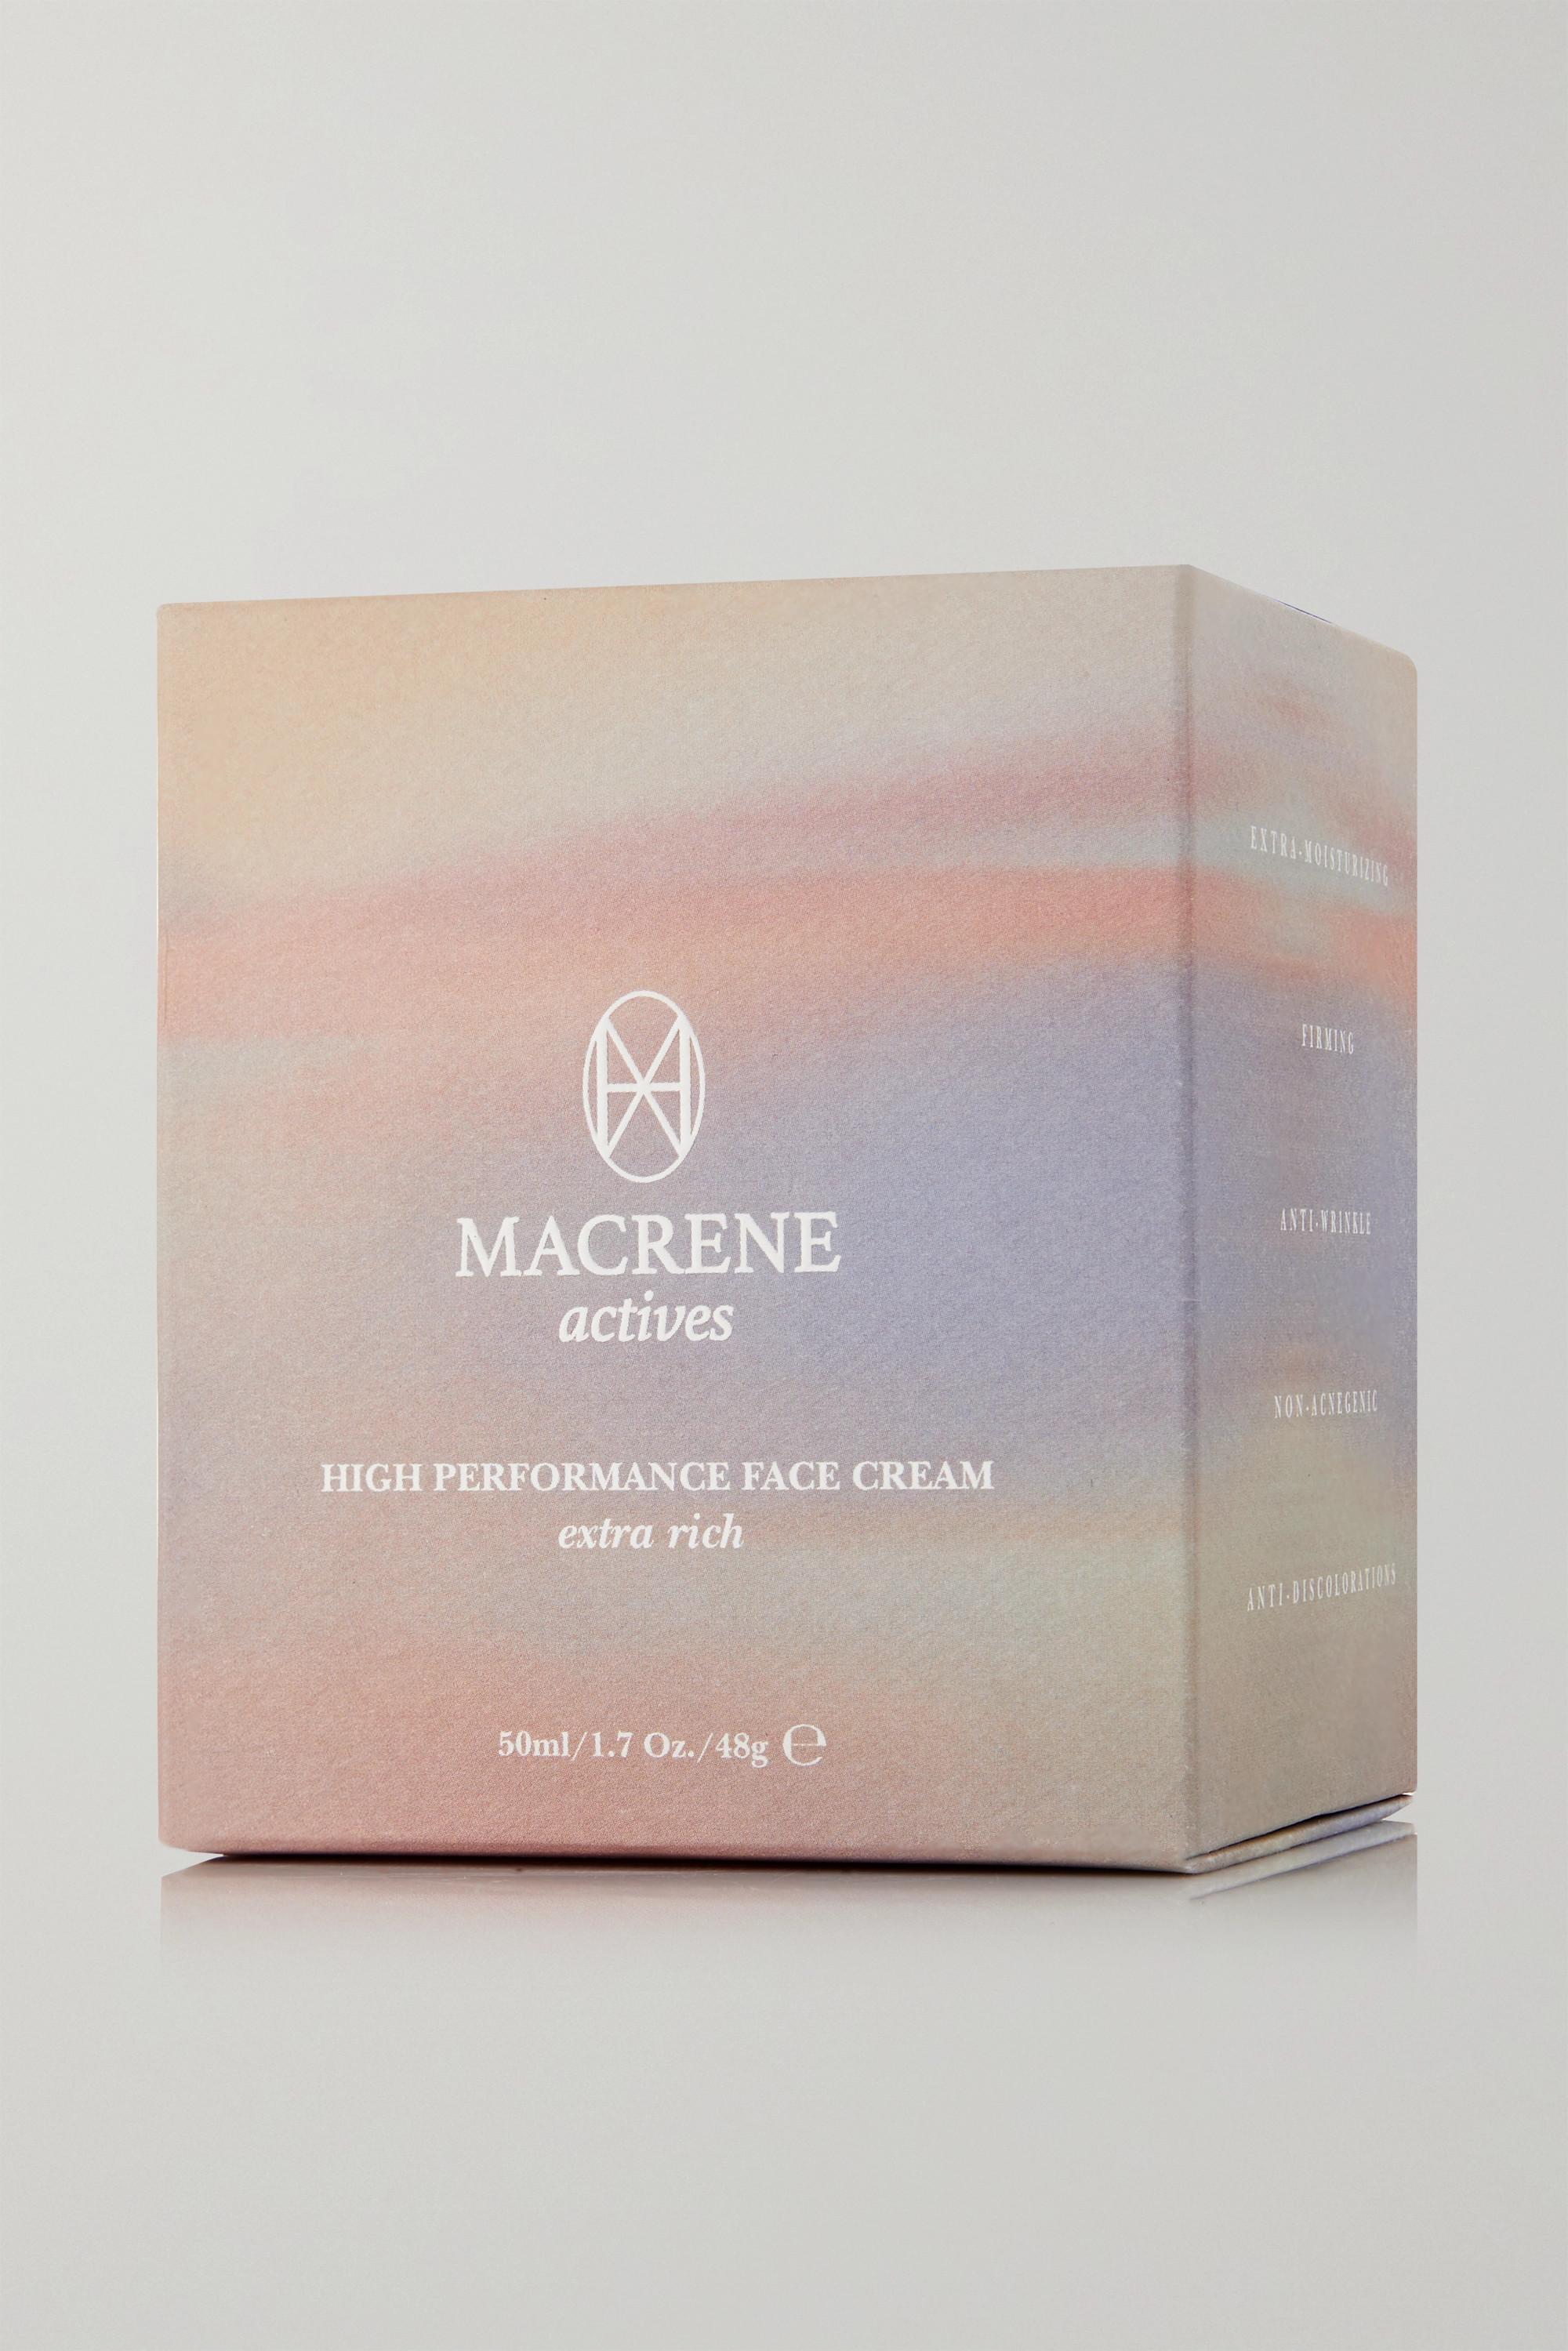 Macrene Actives High Performance Face Cream Extra Rich, 30ml